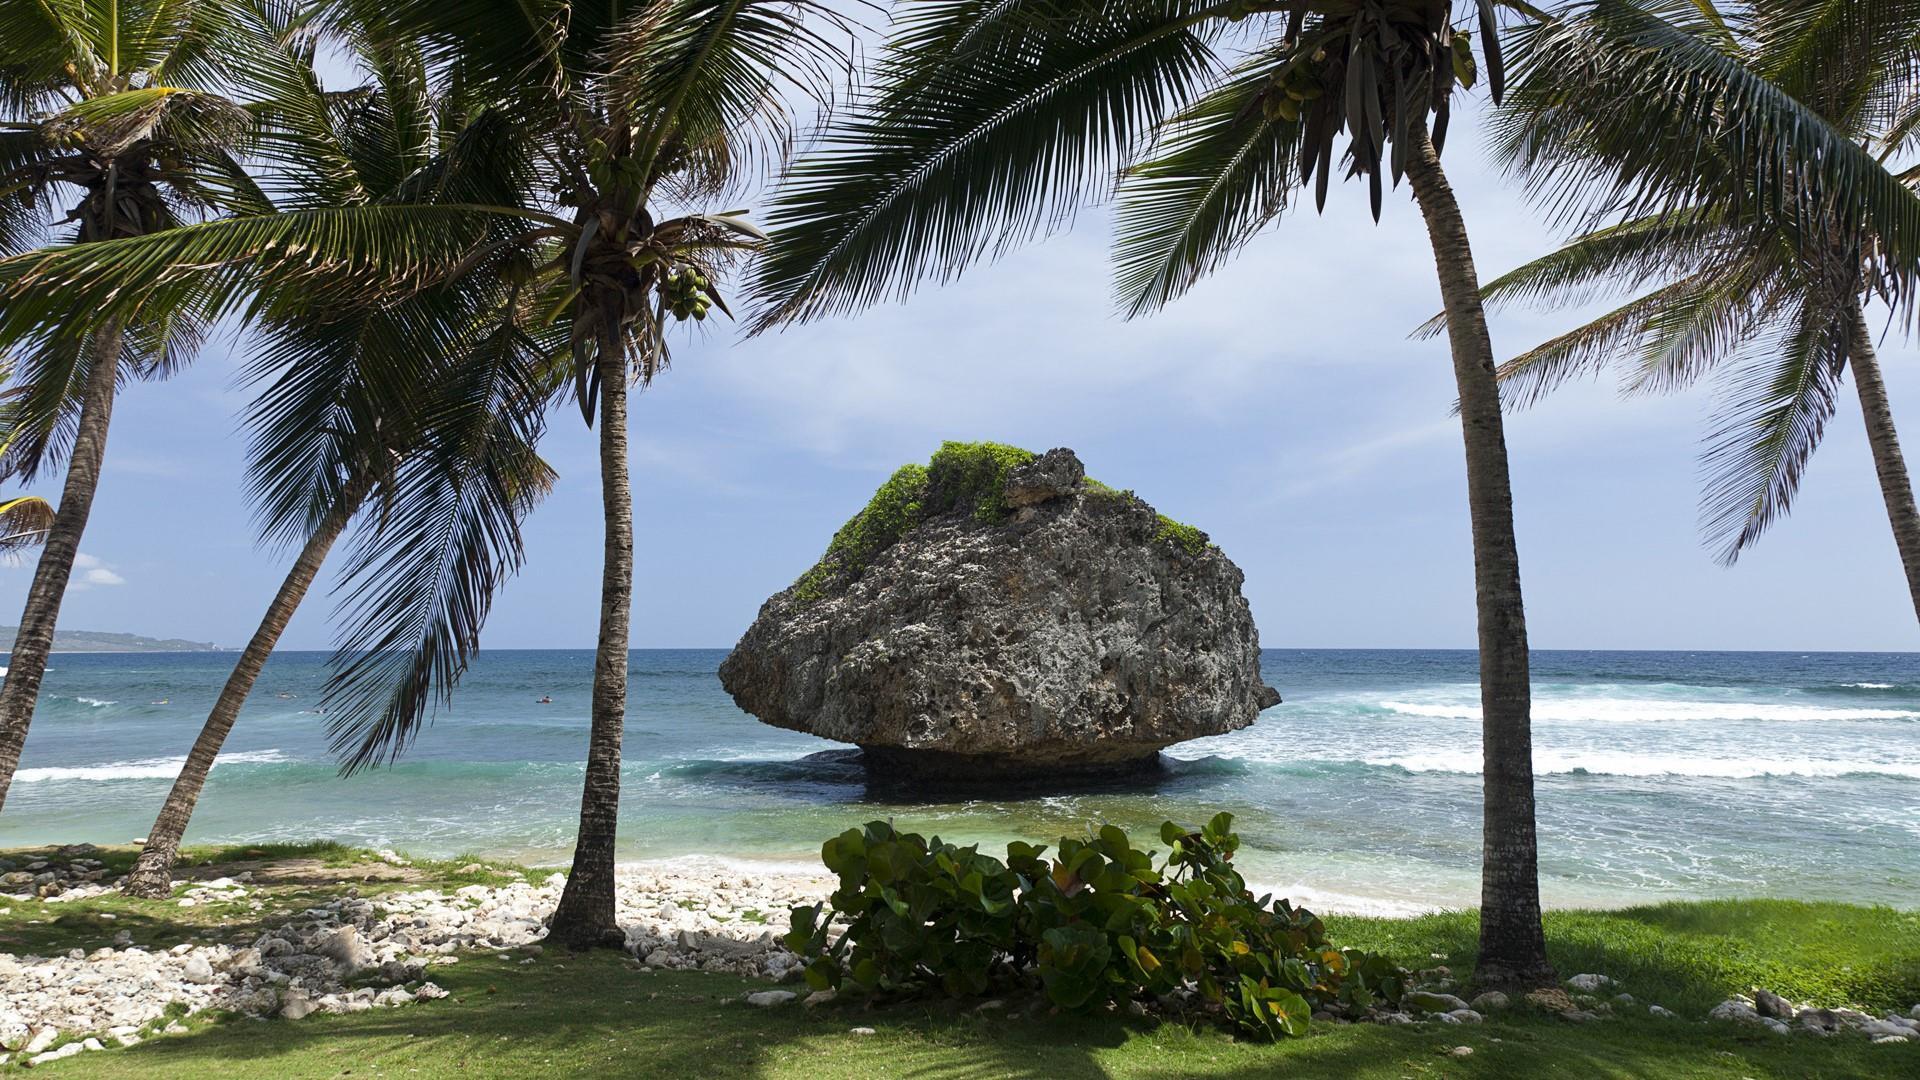 Mushroom rock - Bathsheba Beach, Barbados wallpaper